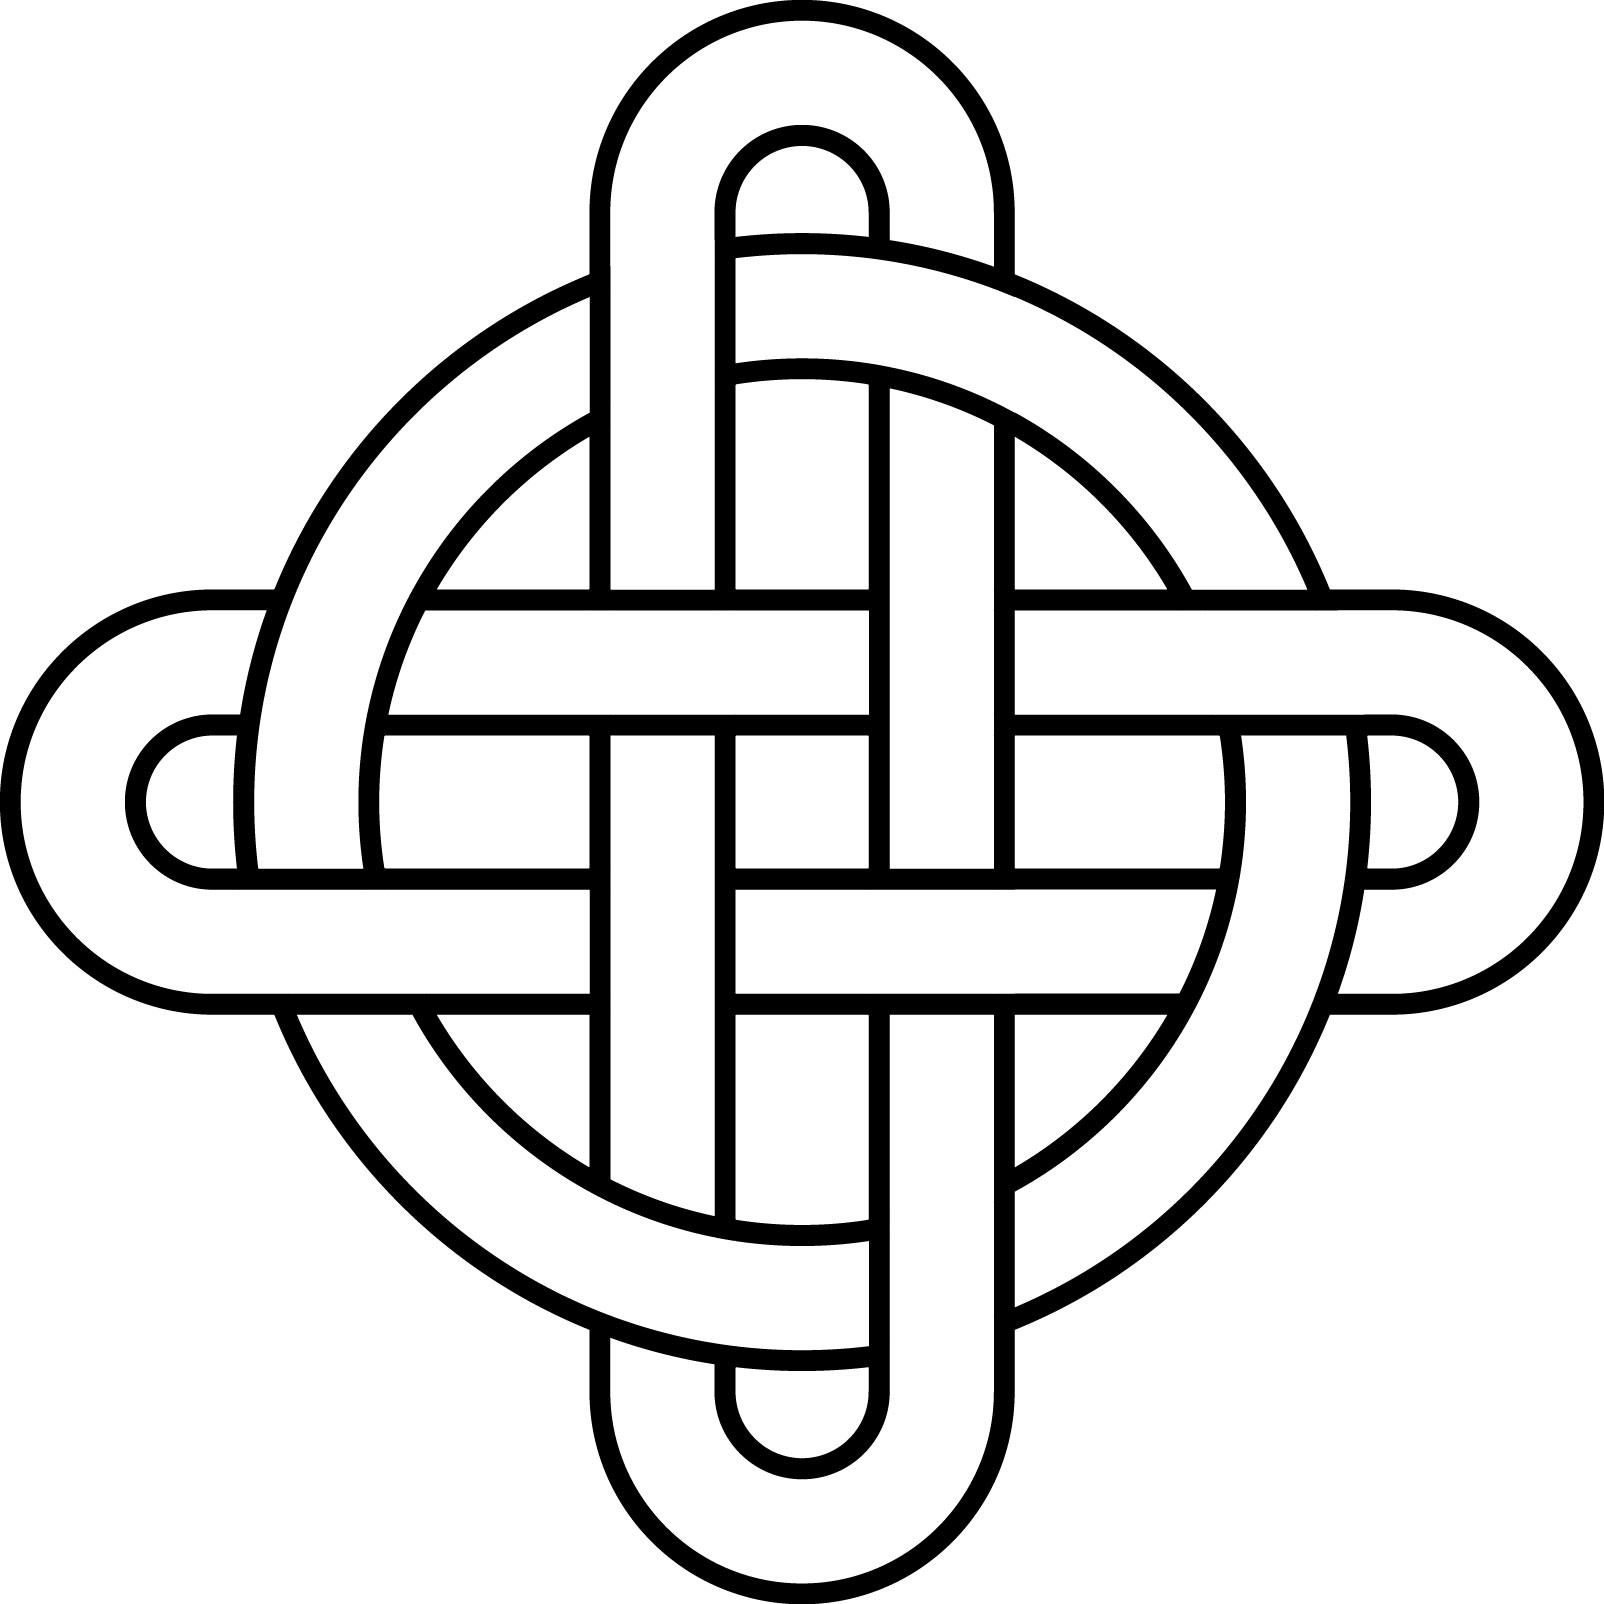 Simple Celtic Knot Designs